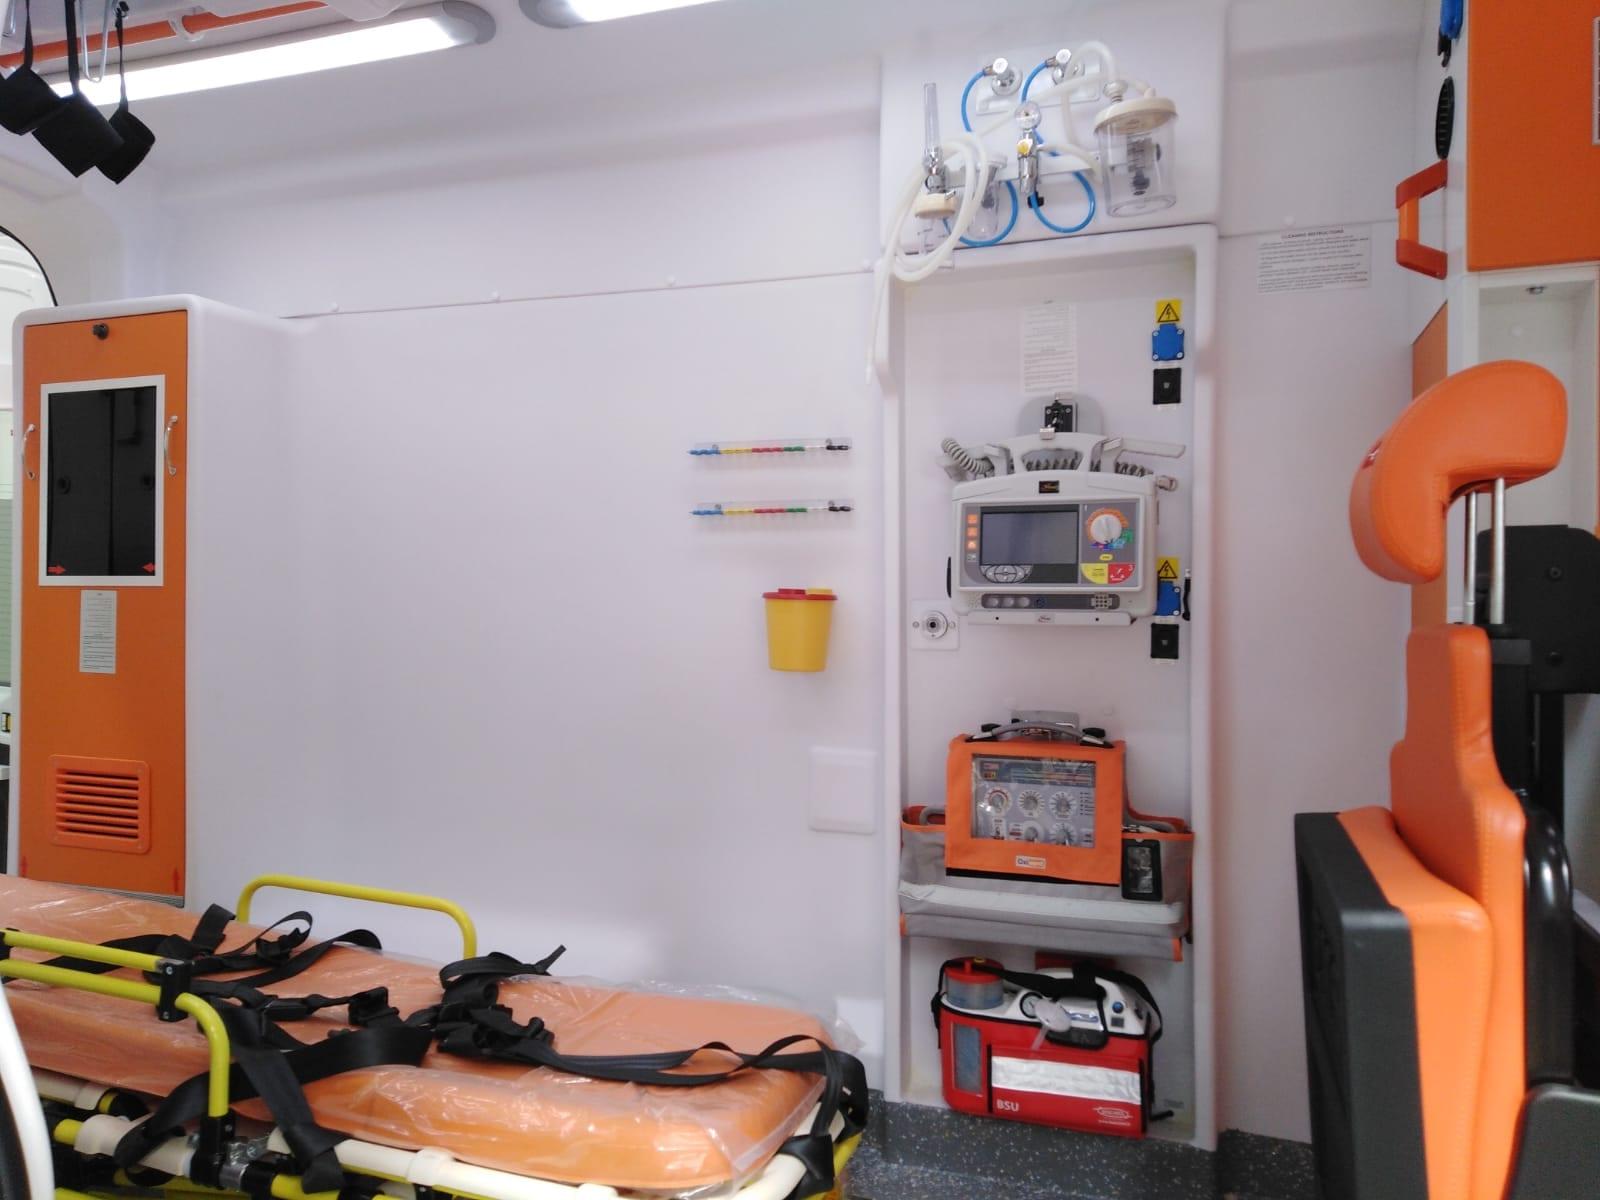 Mercedes ambulance 2019 Ready for shipment 3